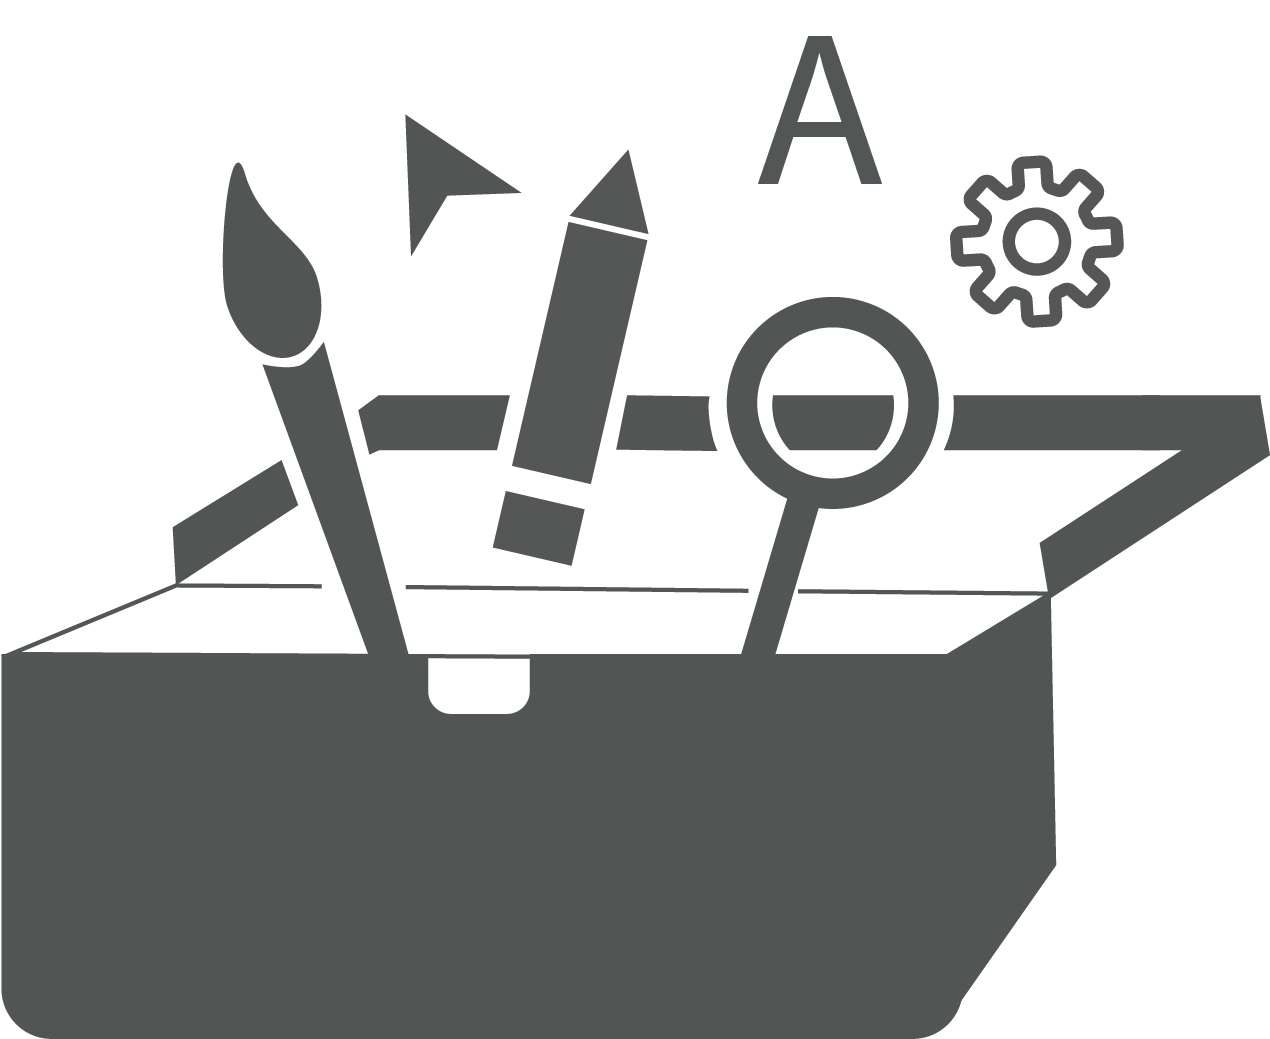 imagegear icon